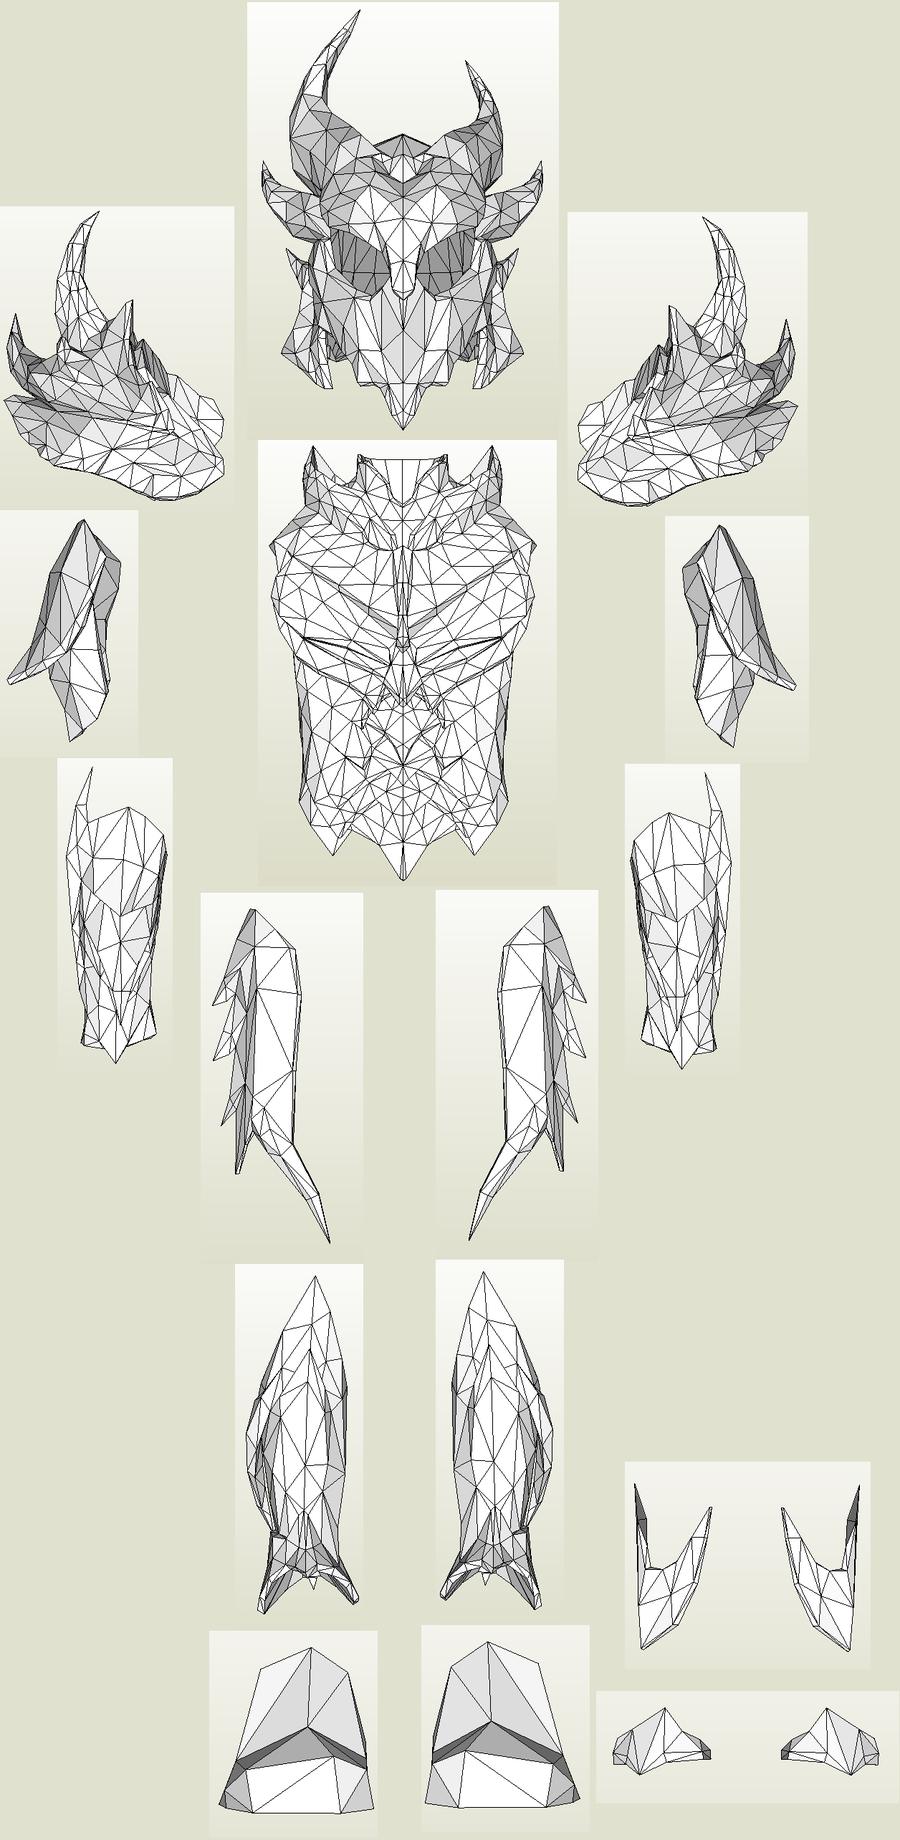 Full daedric armor in pepakura by kuraudo3iantart on craft pronofoot35fo Image collections